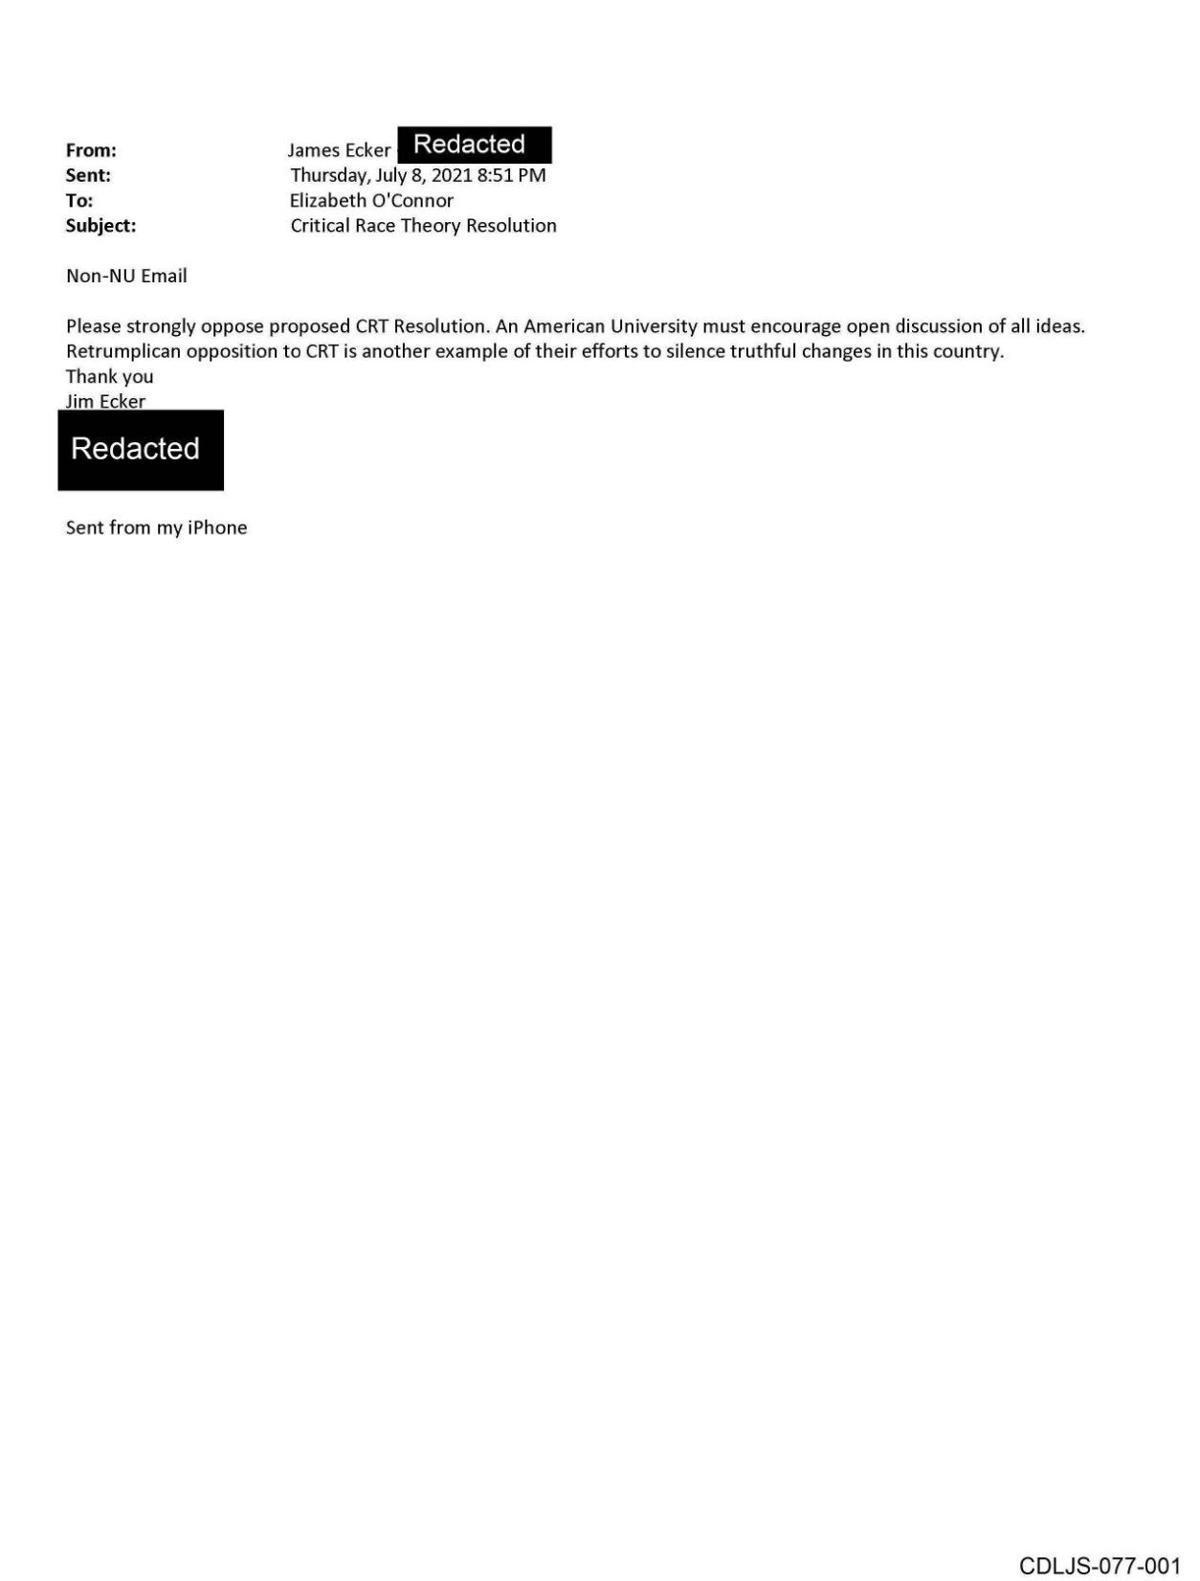 CDLJS-077-001.pdf